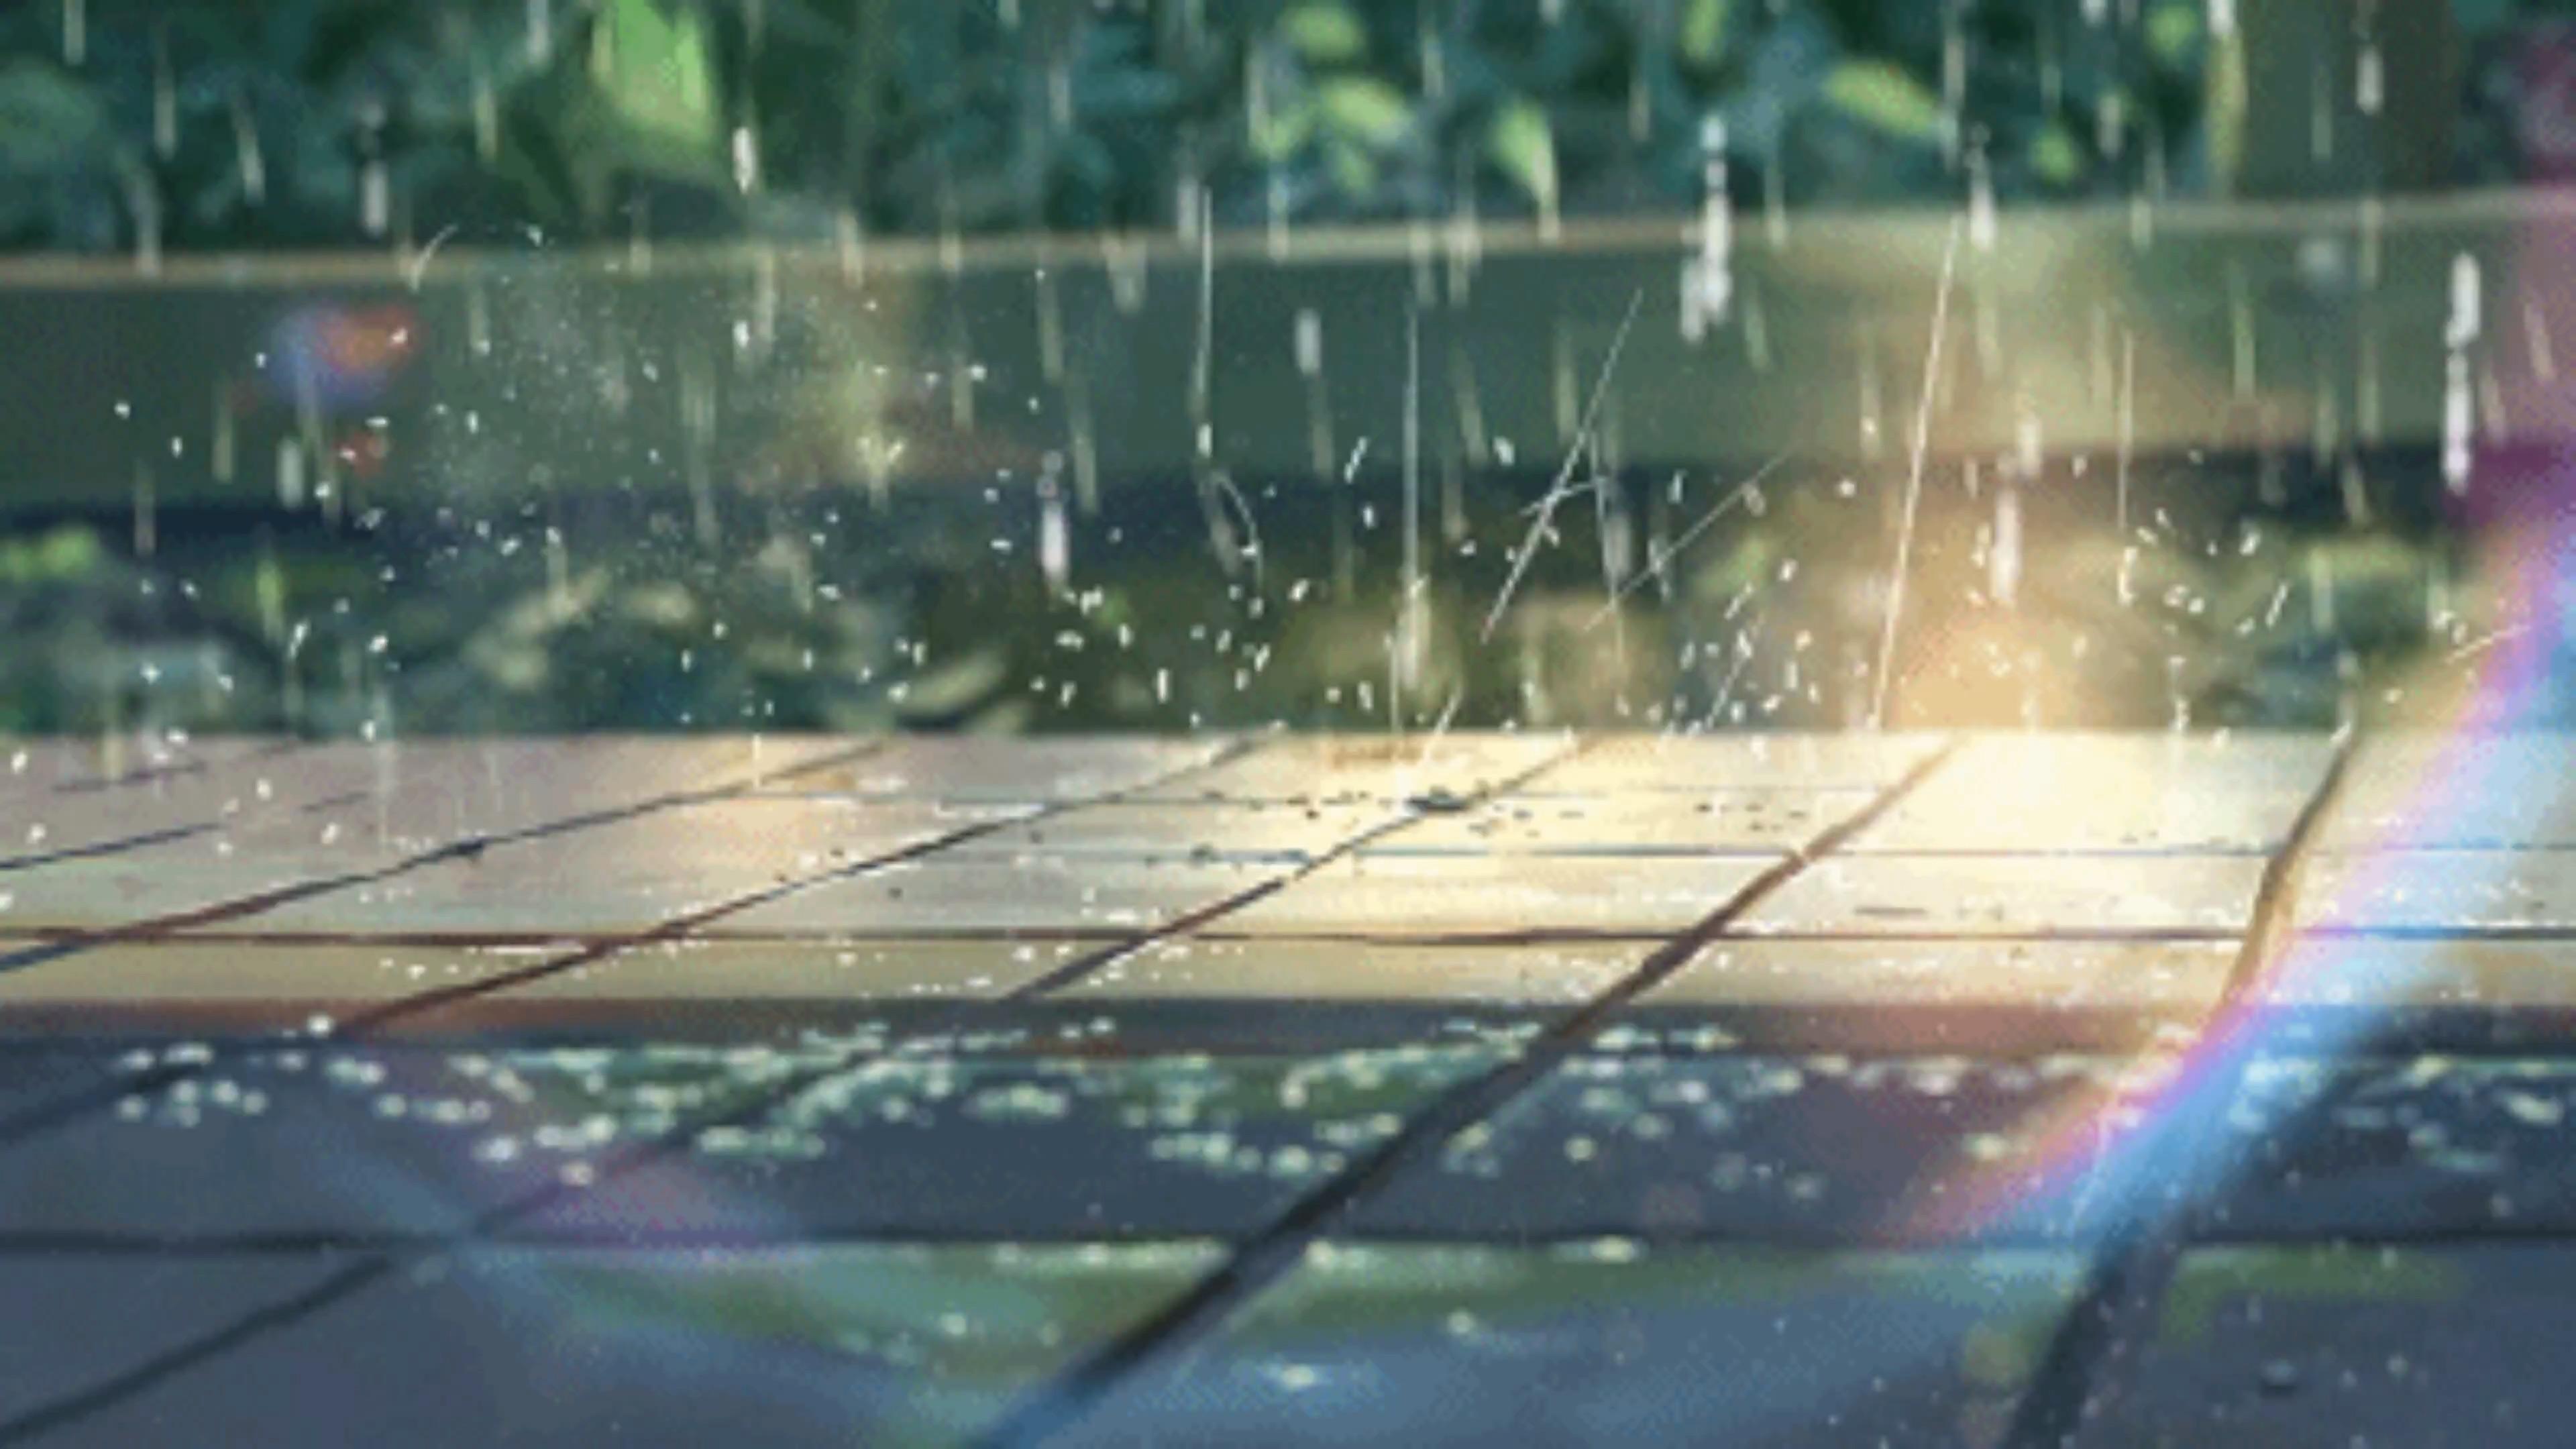 Plastic Rain: More than 1000 Tons of Microplastic Rain onto Western US